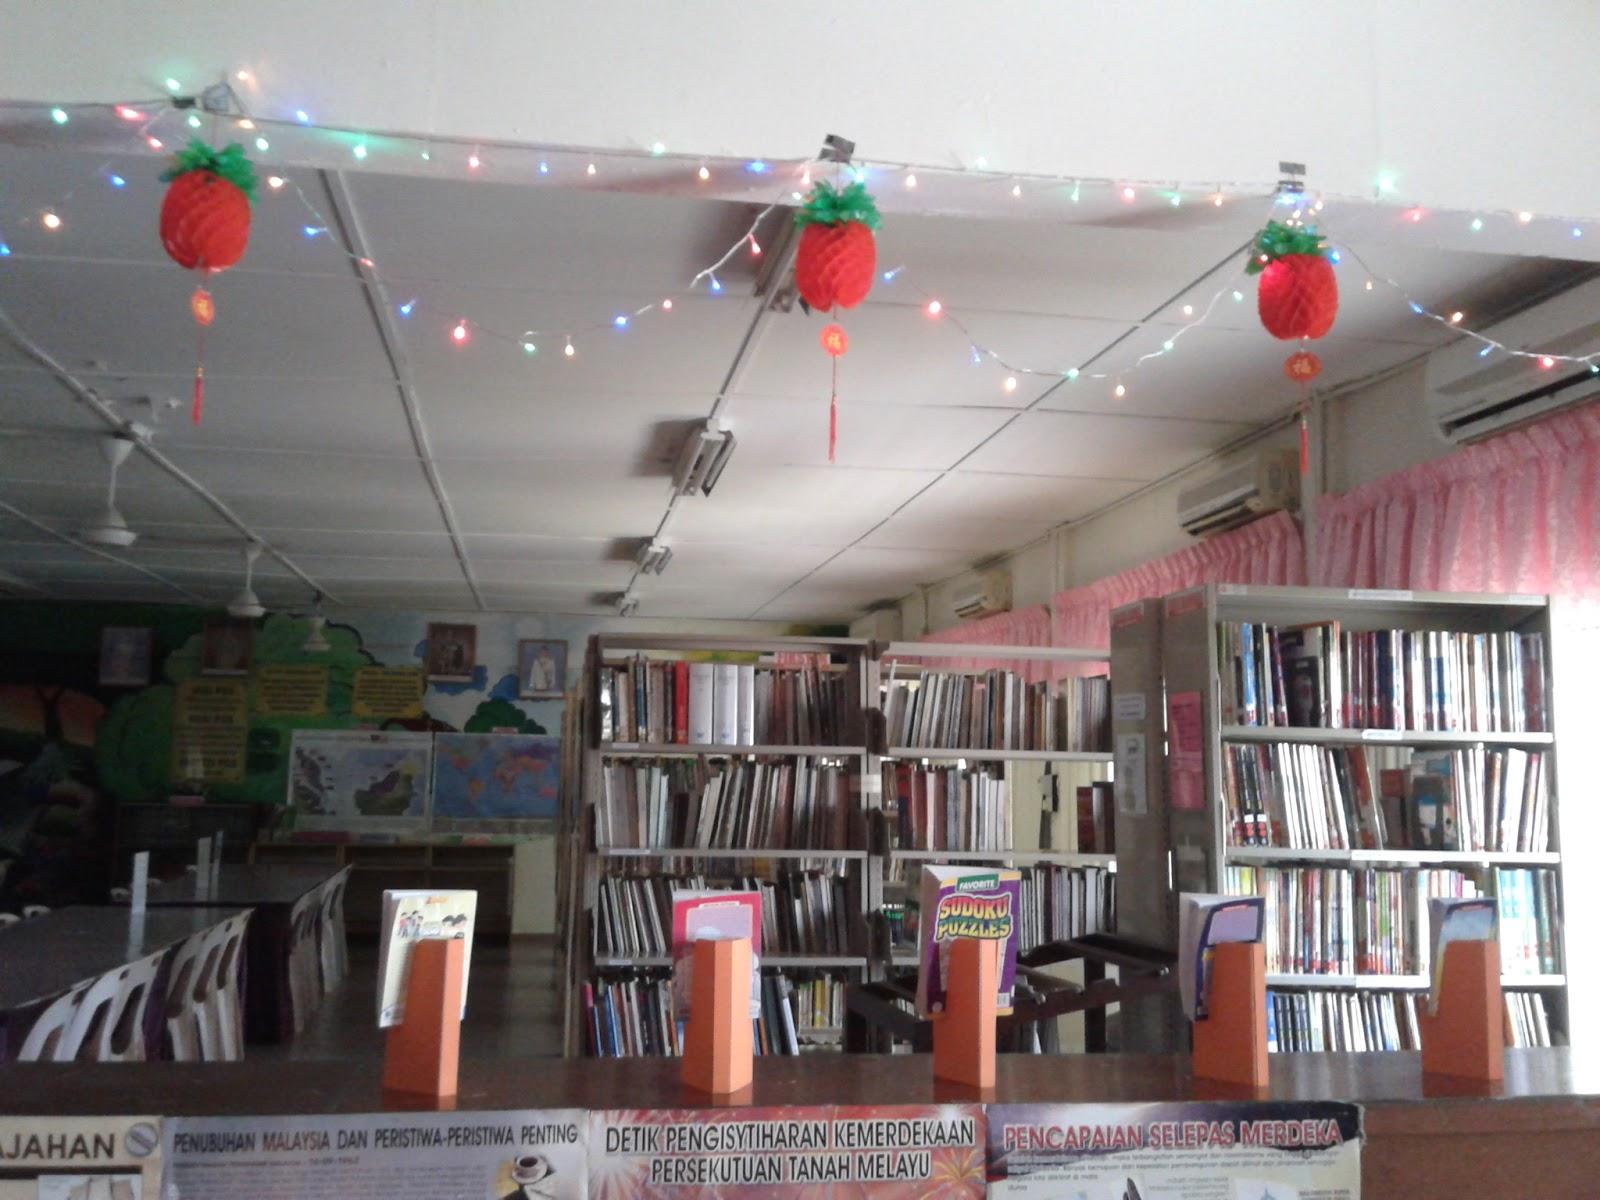 Hiasan bertema Tahun Baru Cina di Pusat Sumber Sekolah